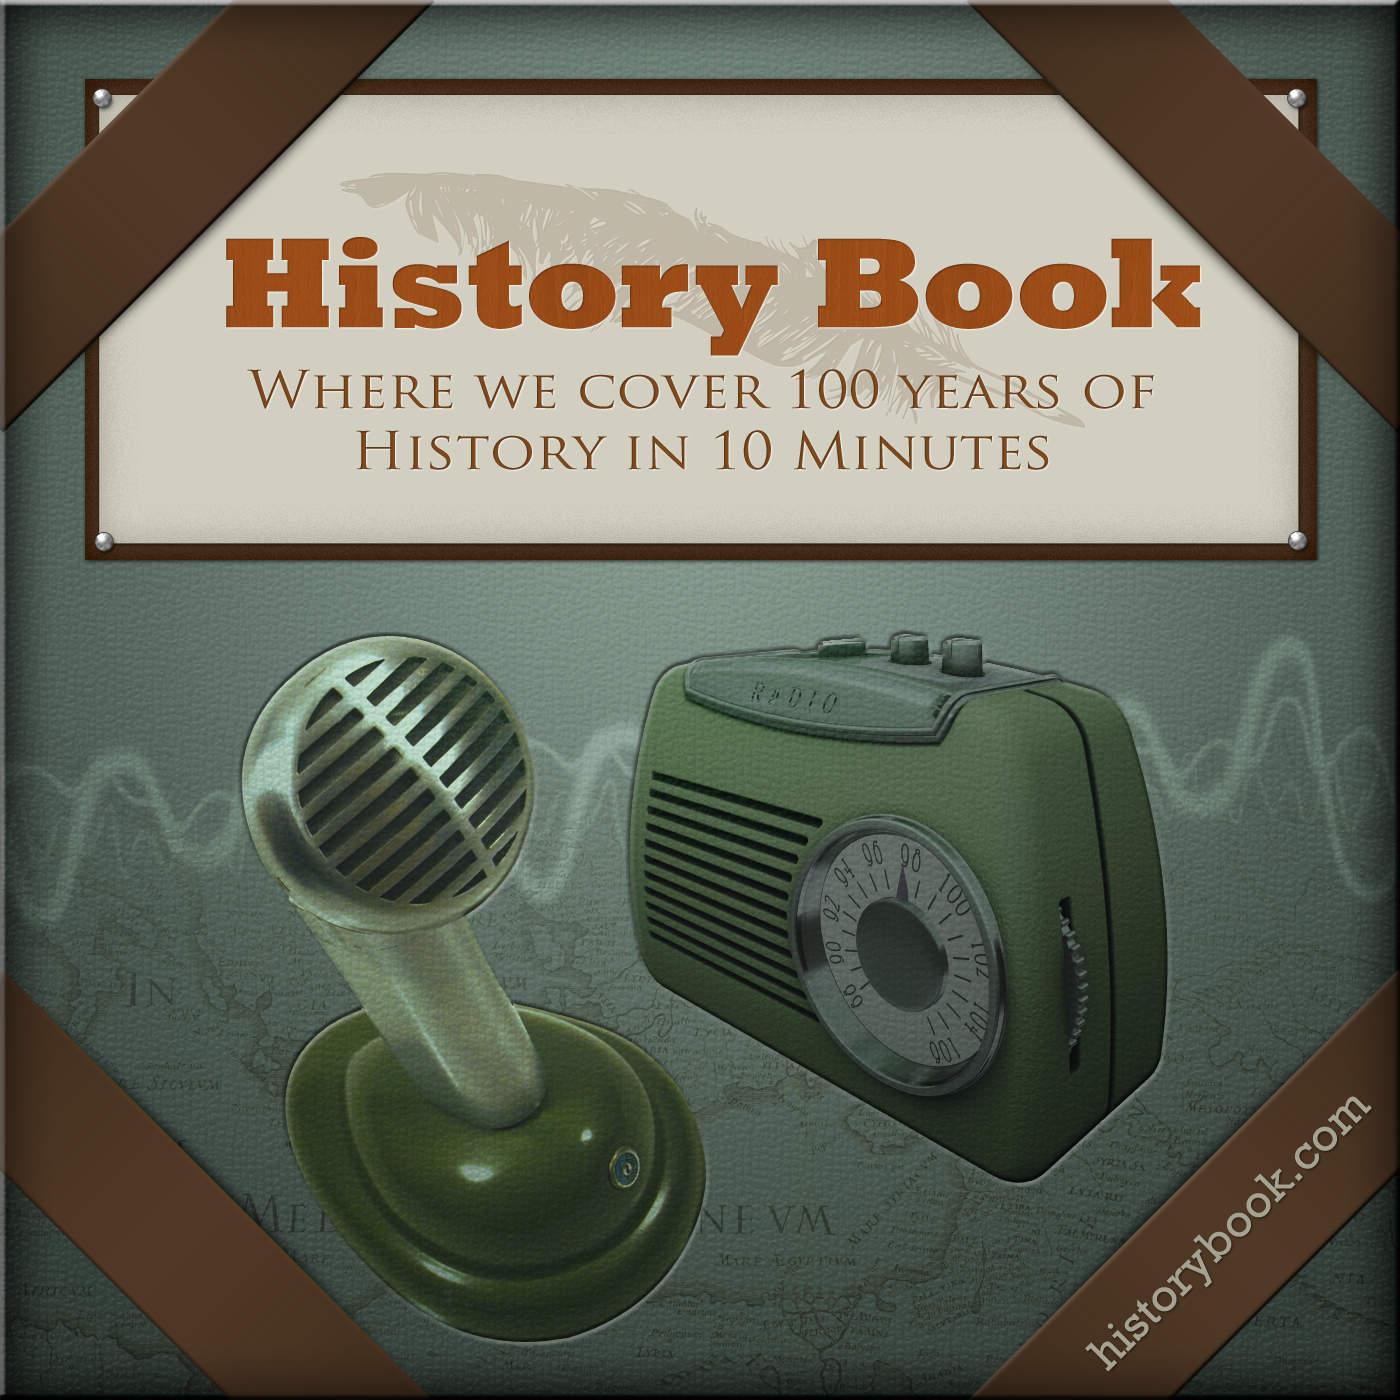 HistoryBookPodcast